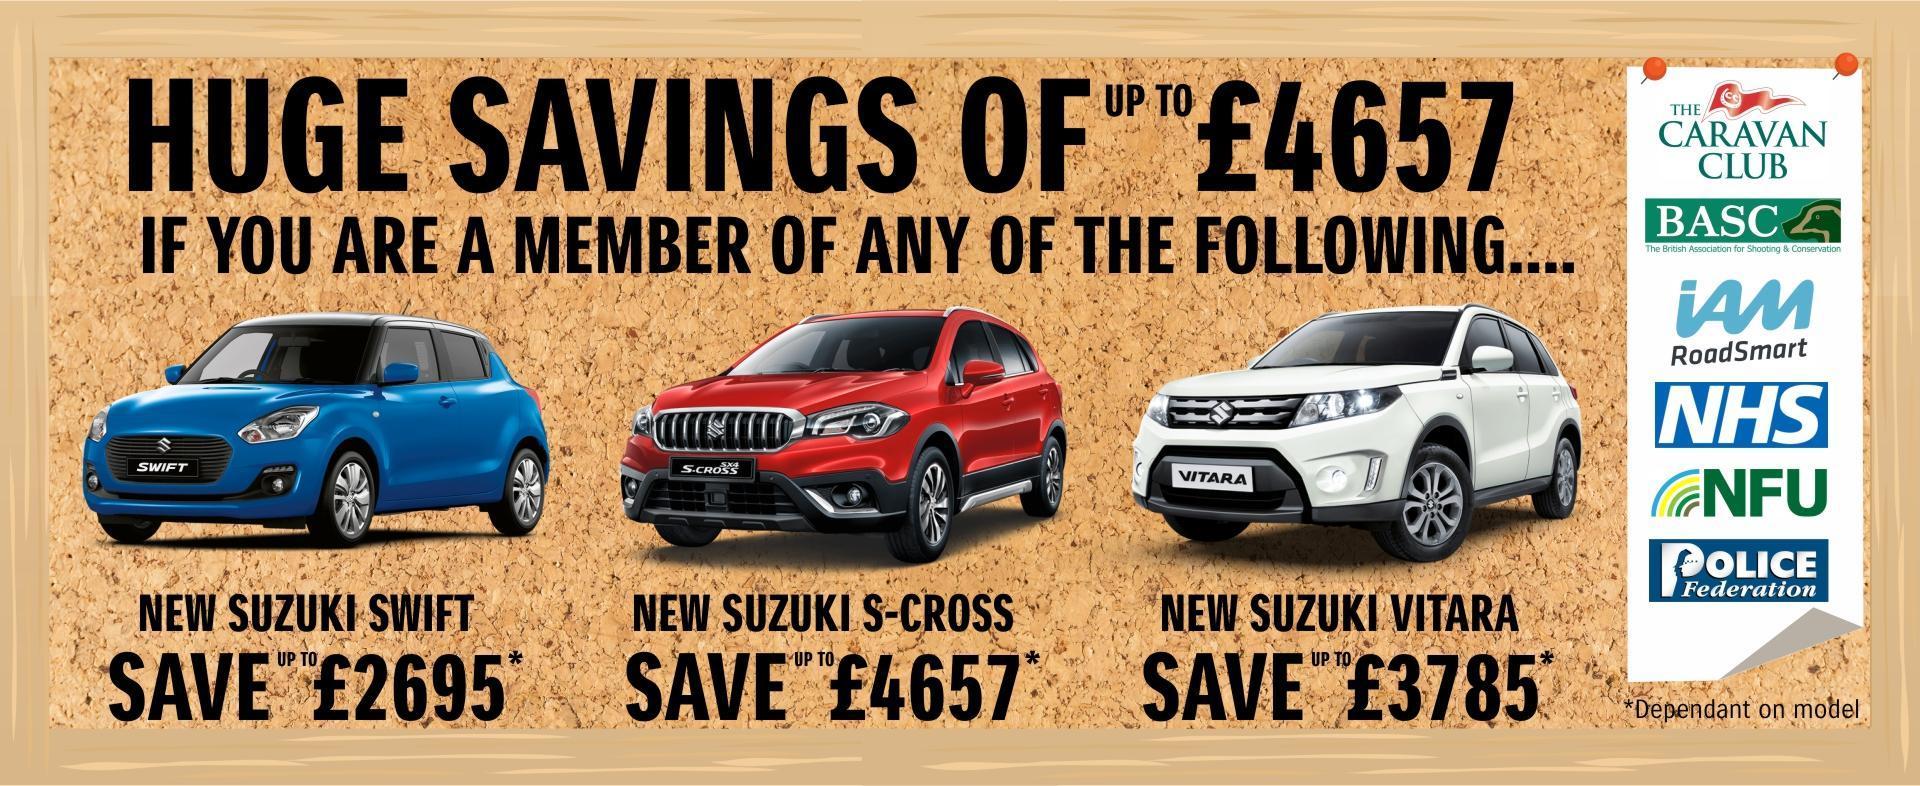 Suzuki Affinity Offers